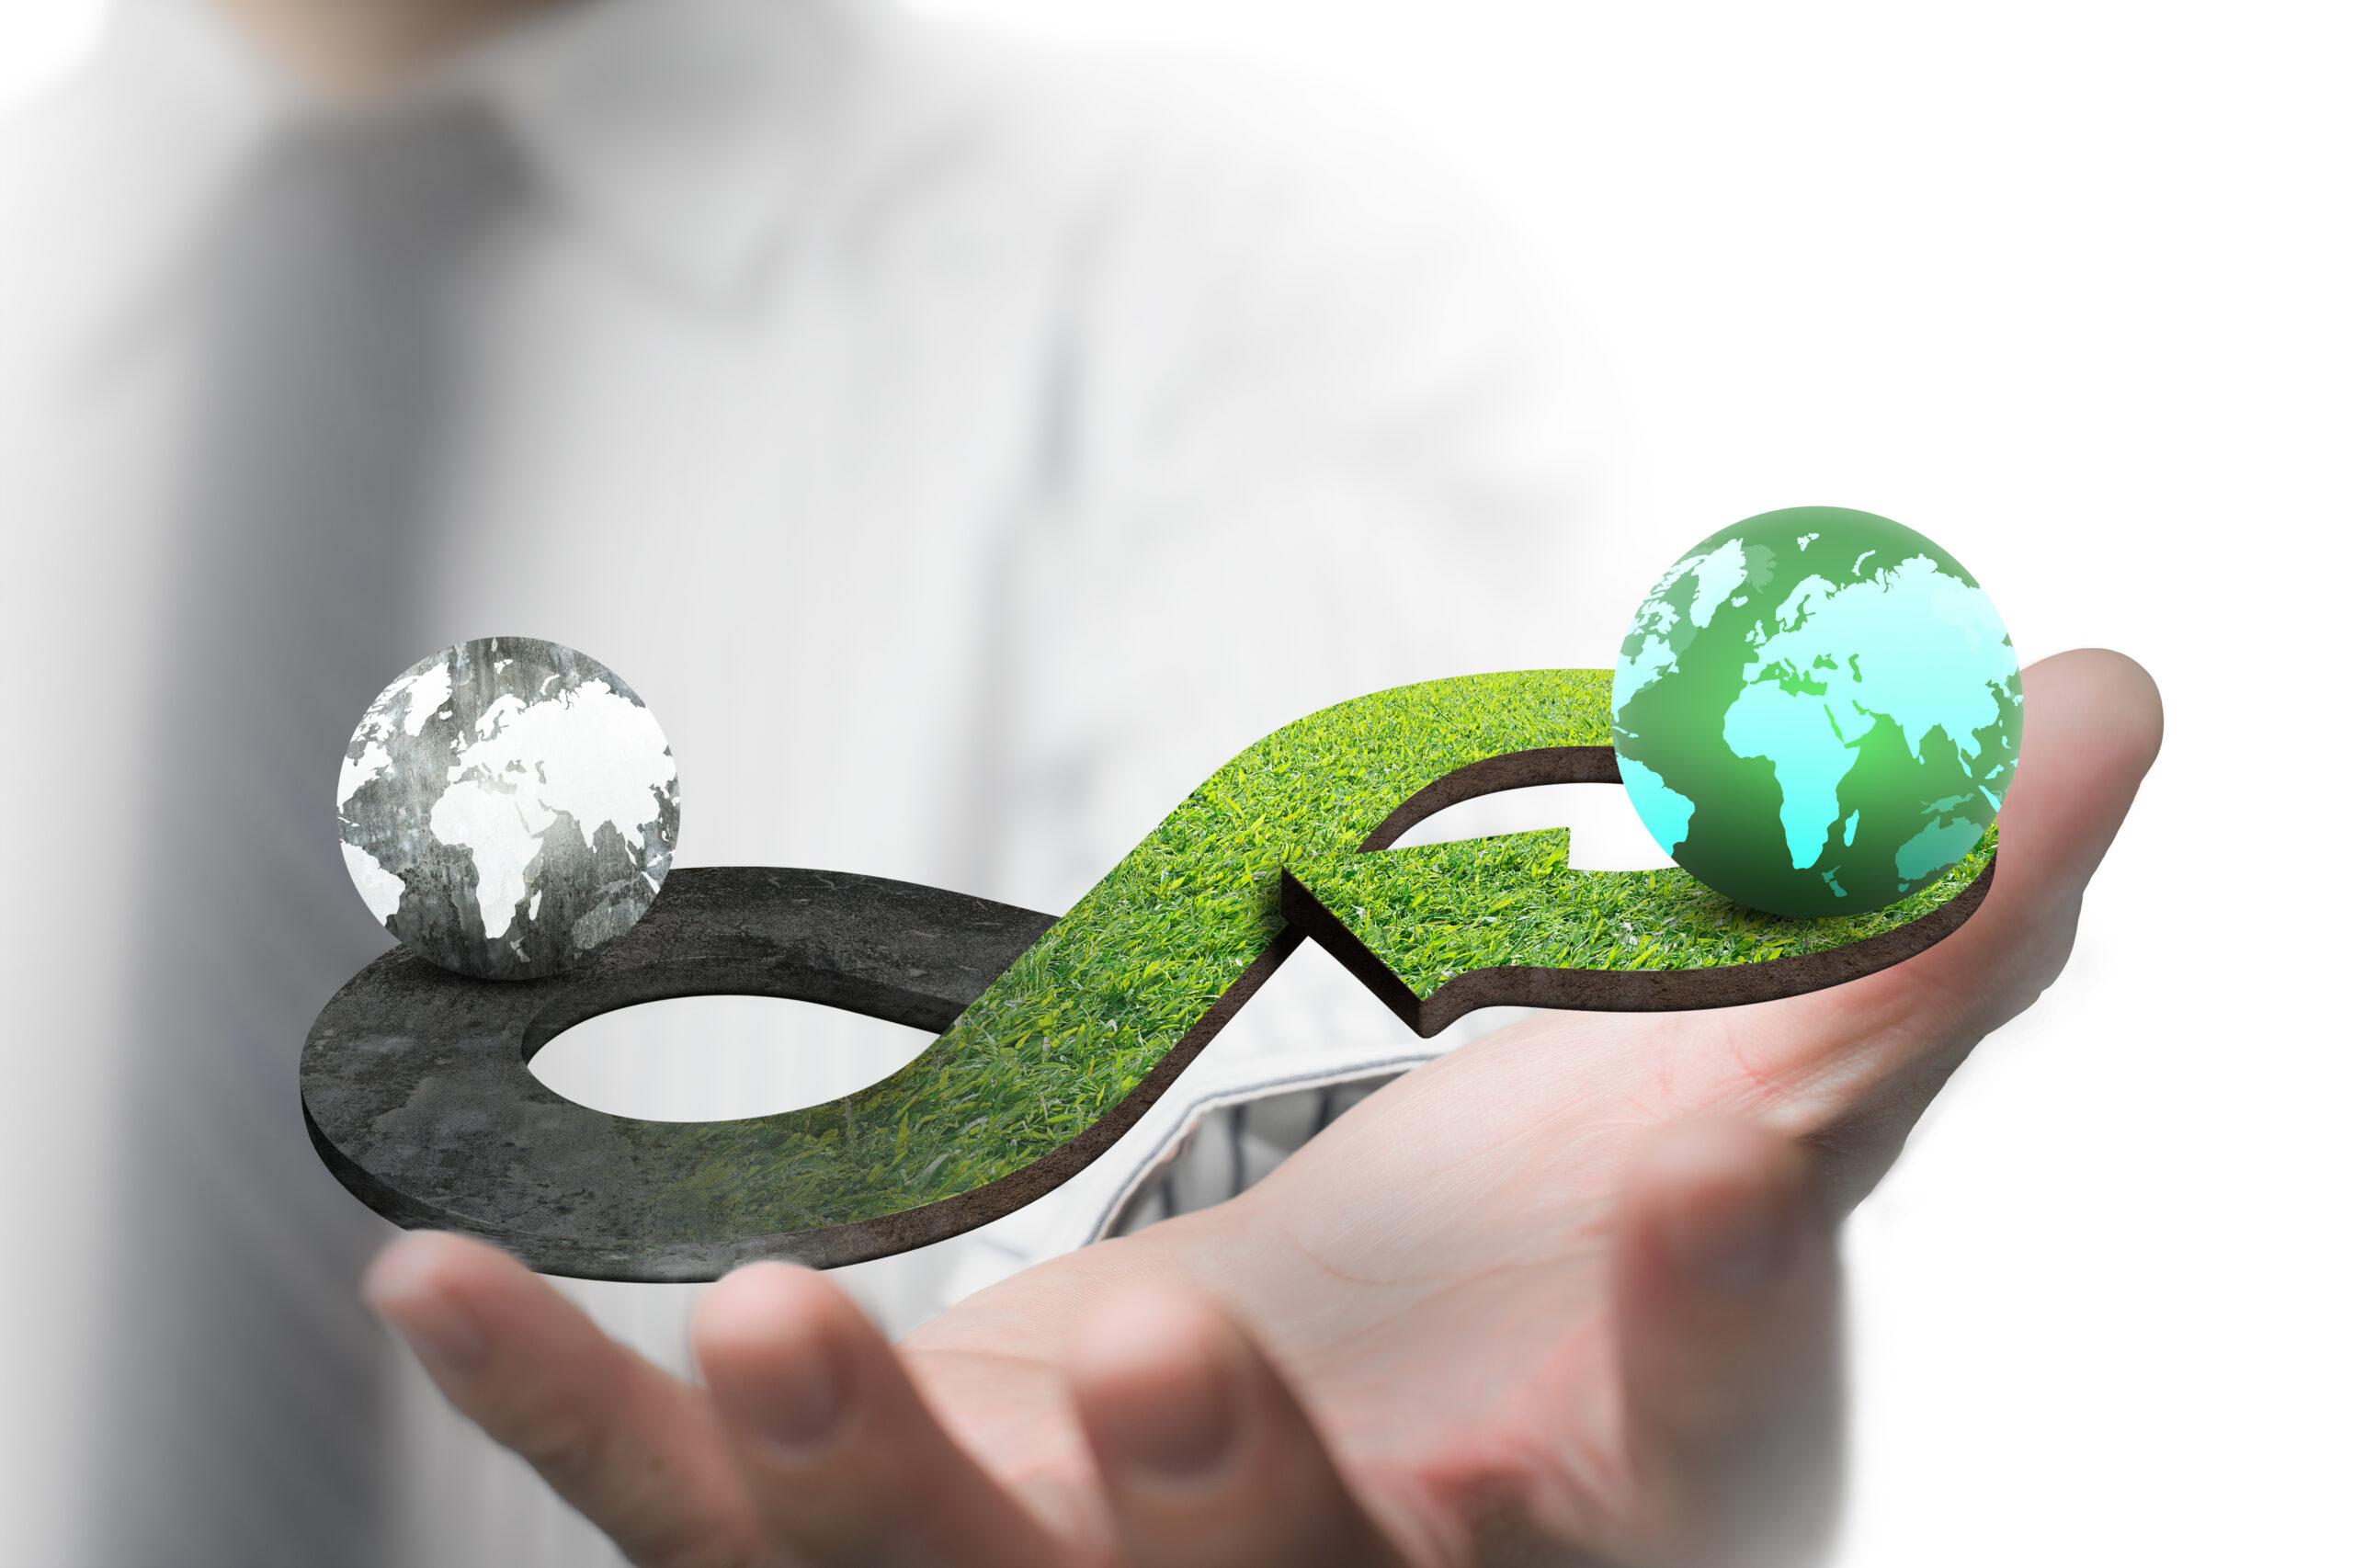 The Circular Economy: Put Your Purpose Into Focus